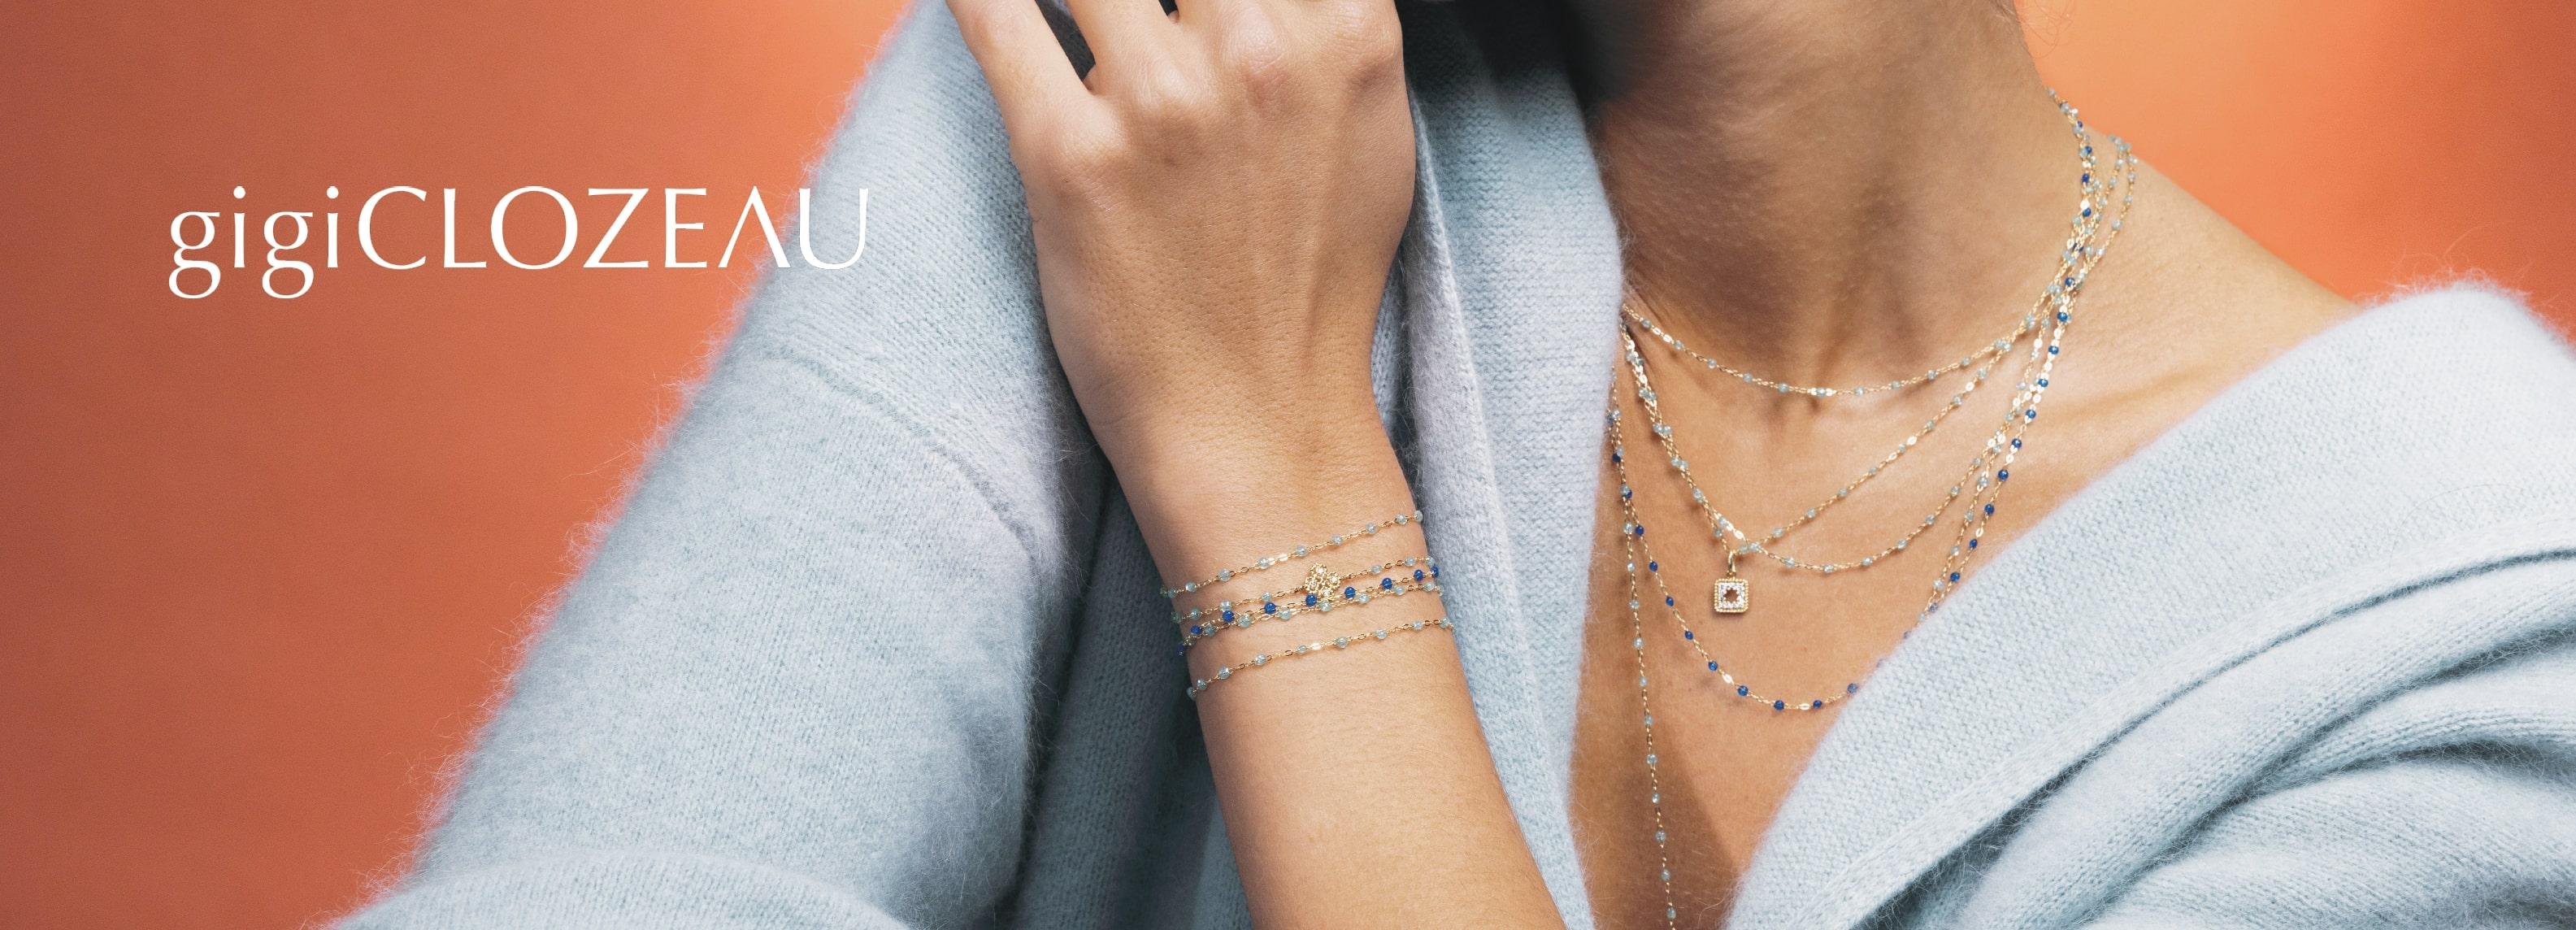 Gigi Clozeau | Bijouterie Mathieu